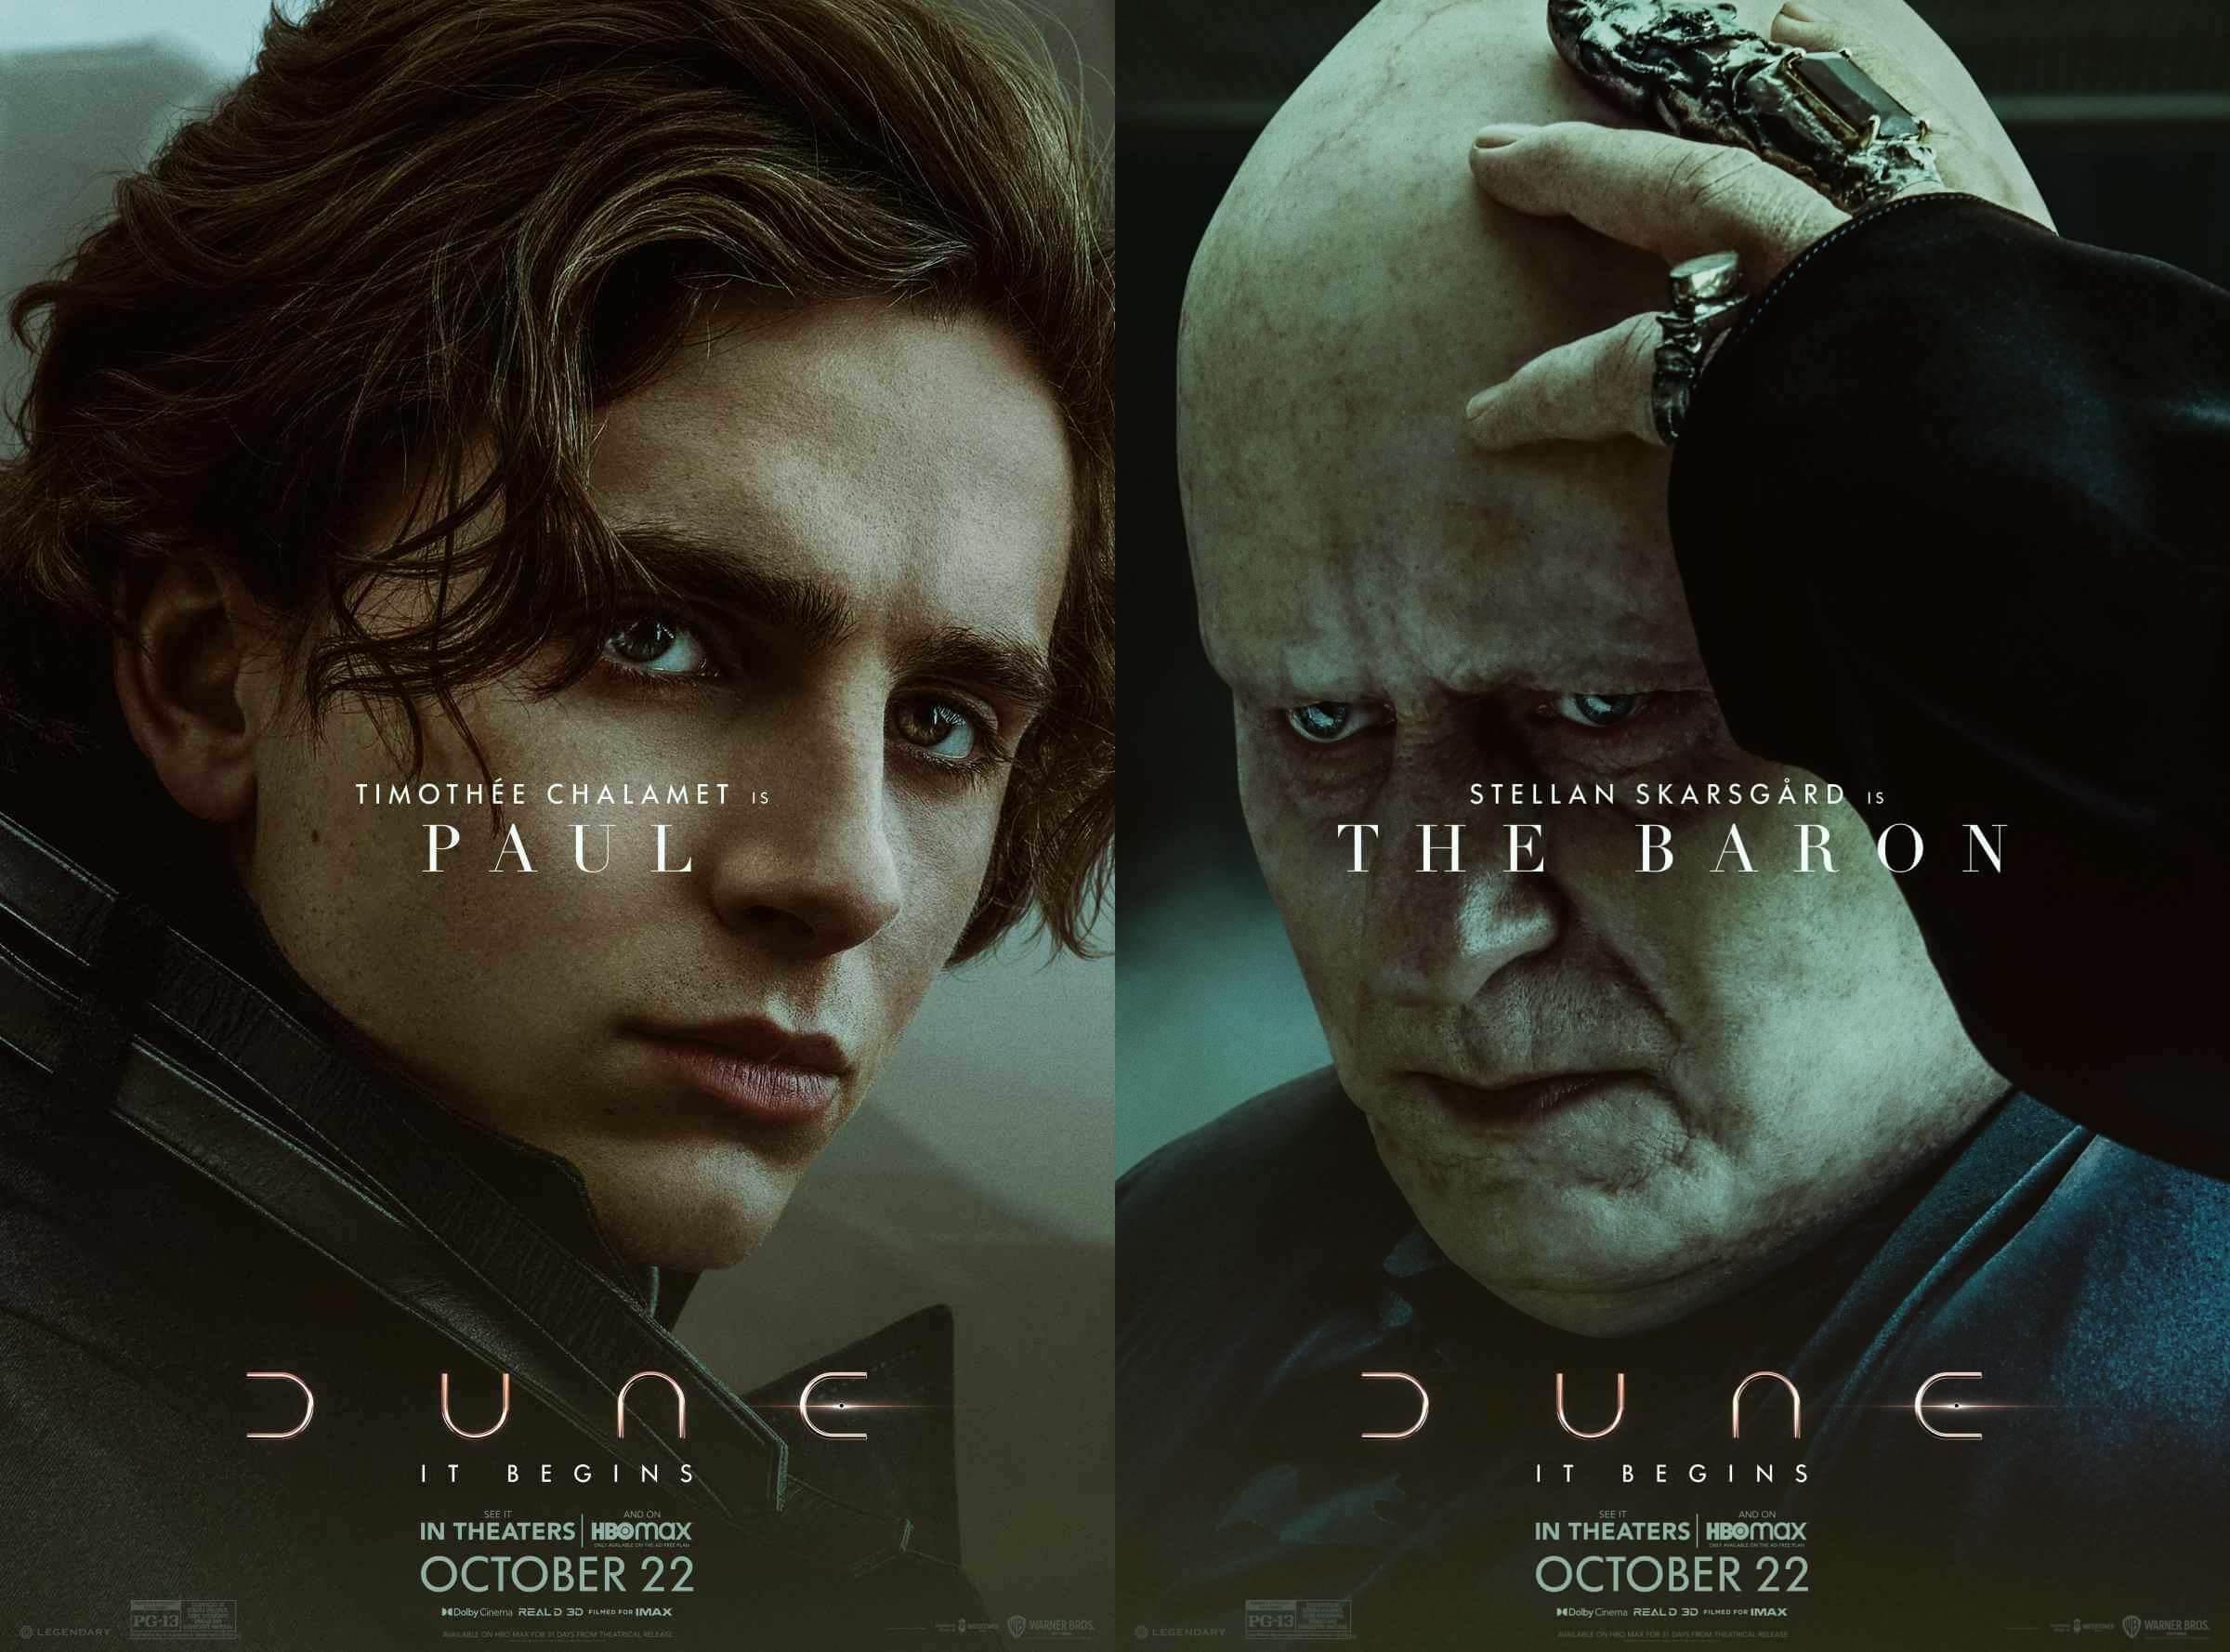 duna-persoangens-01-legado-plus